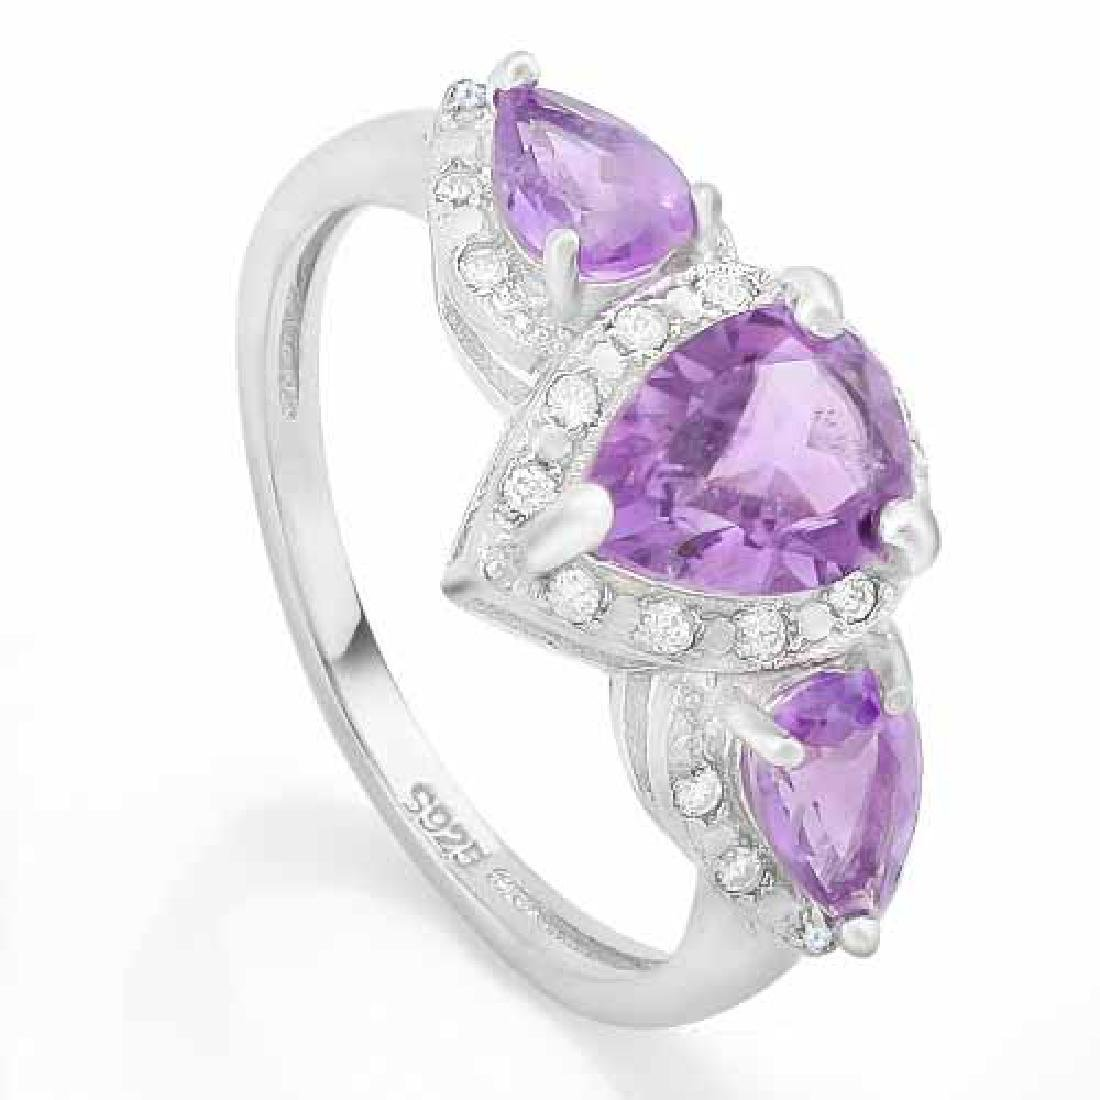 1 3/4 CARAT AMETHYST & DIAMOND 925 STERLING SILVER RING